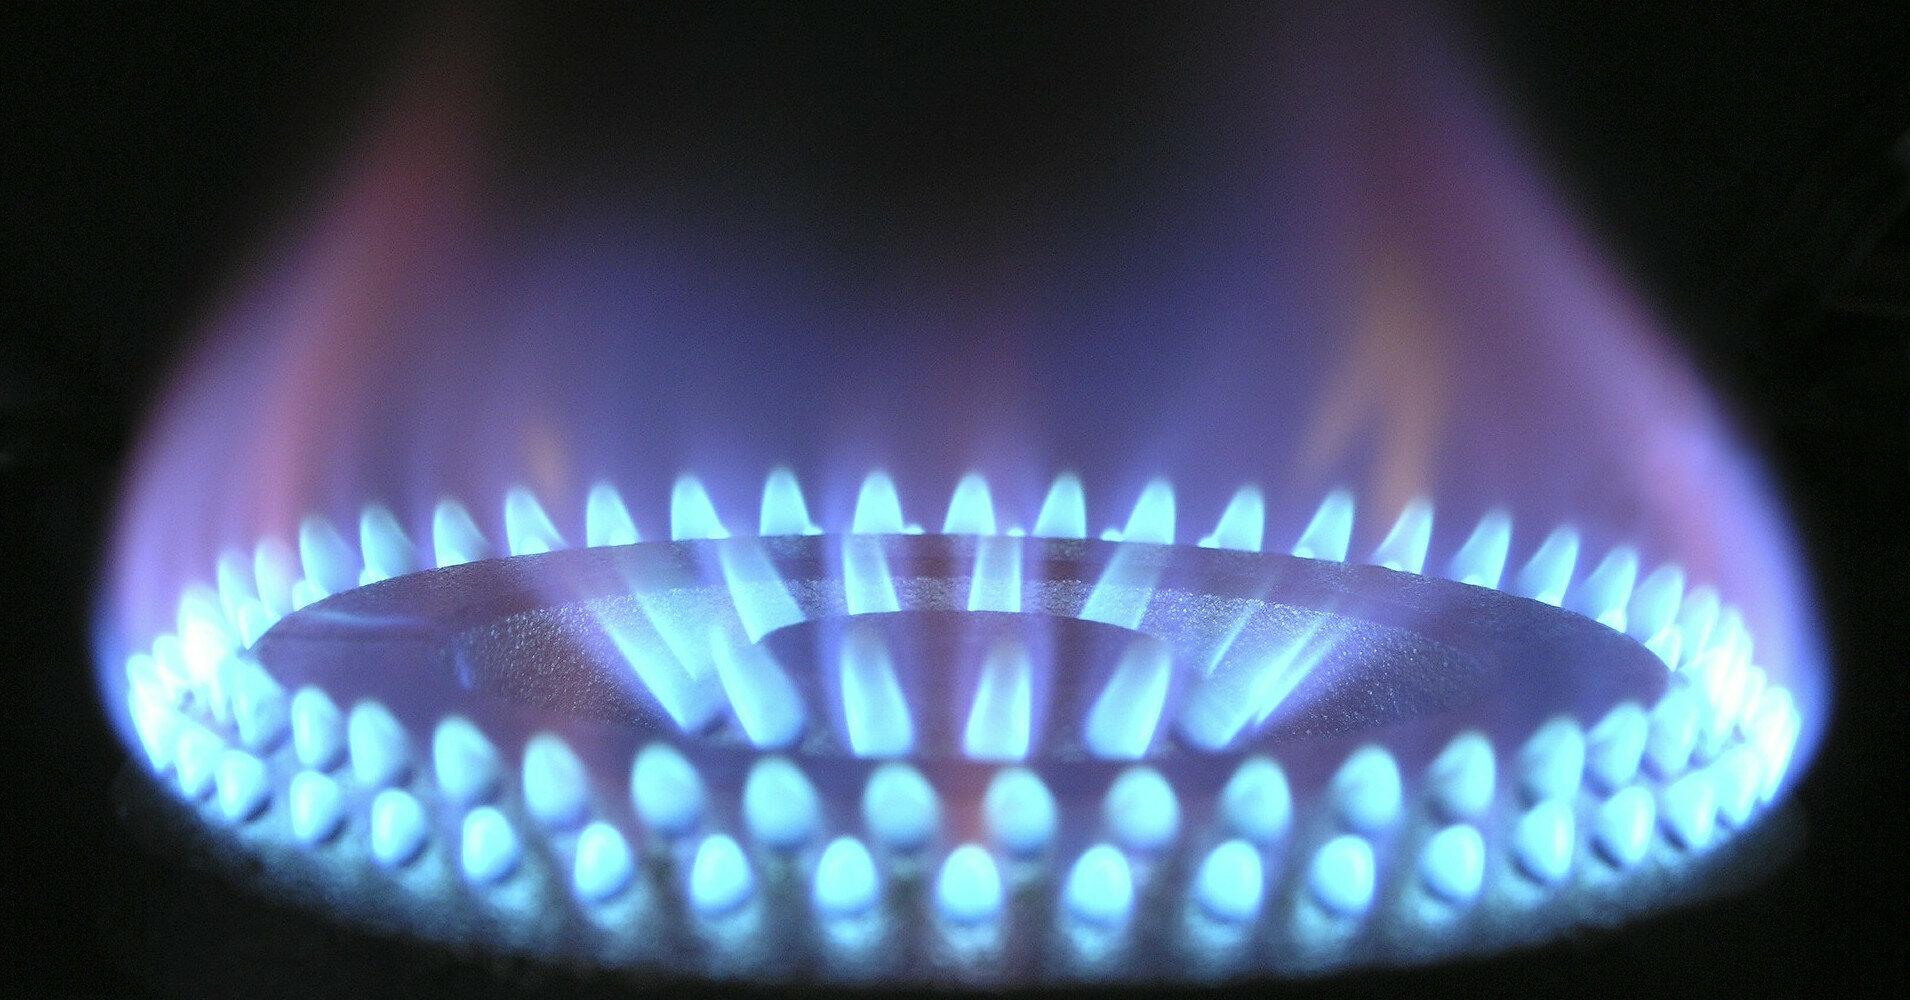 Цена на газ в Европе взлетела до $464 за тысячу кубометров